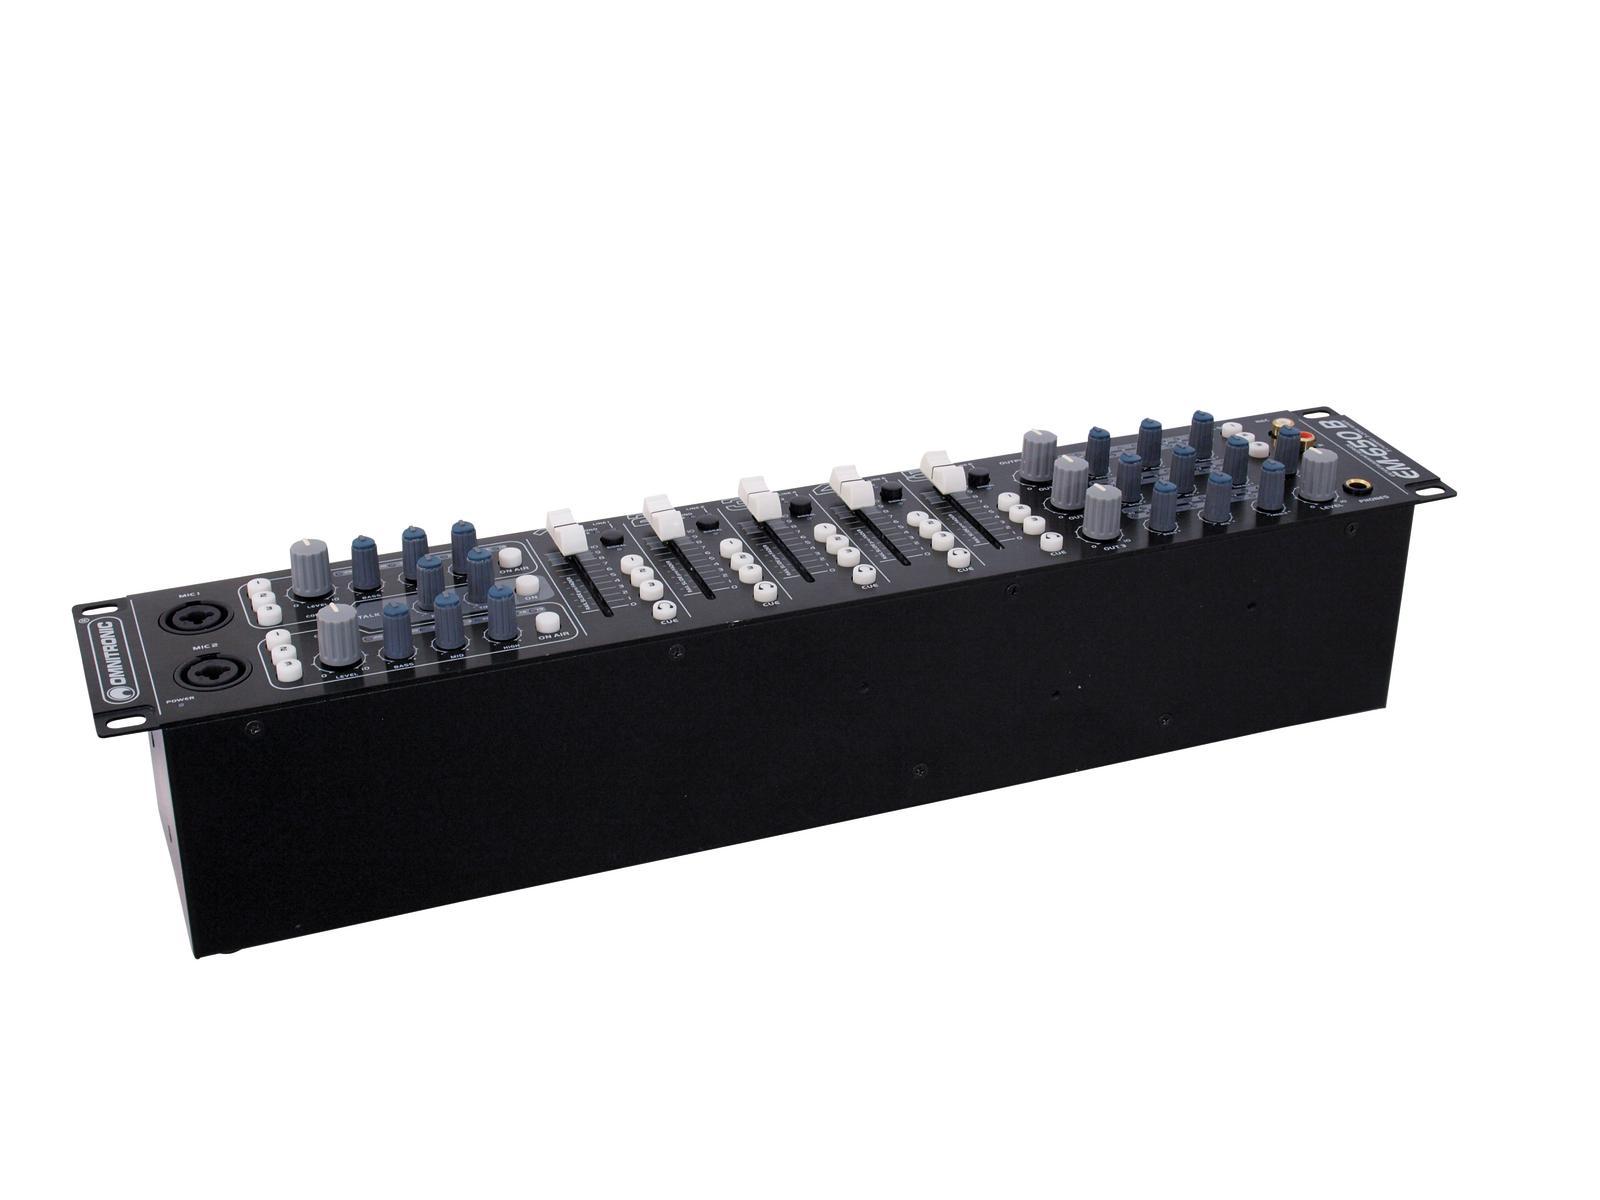 OMNITRONIC EM-650B Intrattenimento mixer